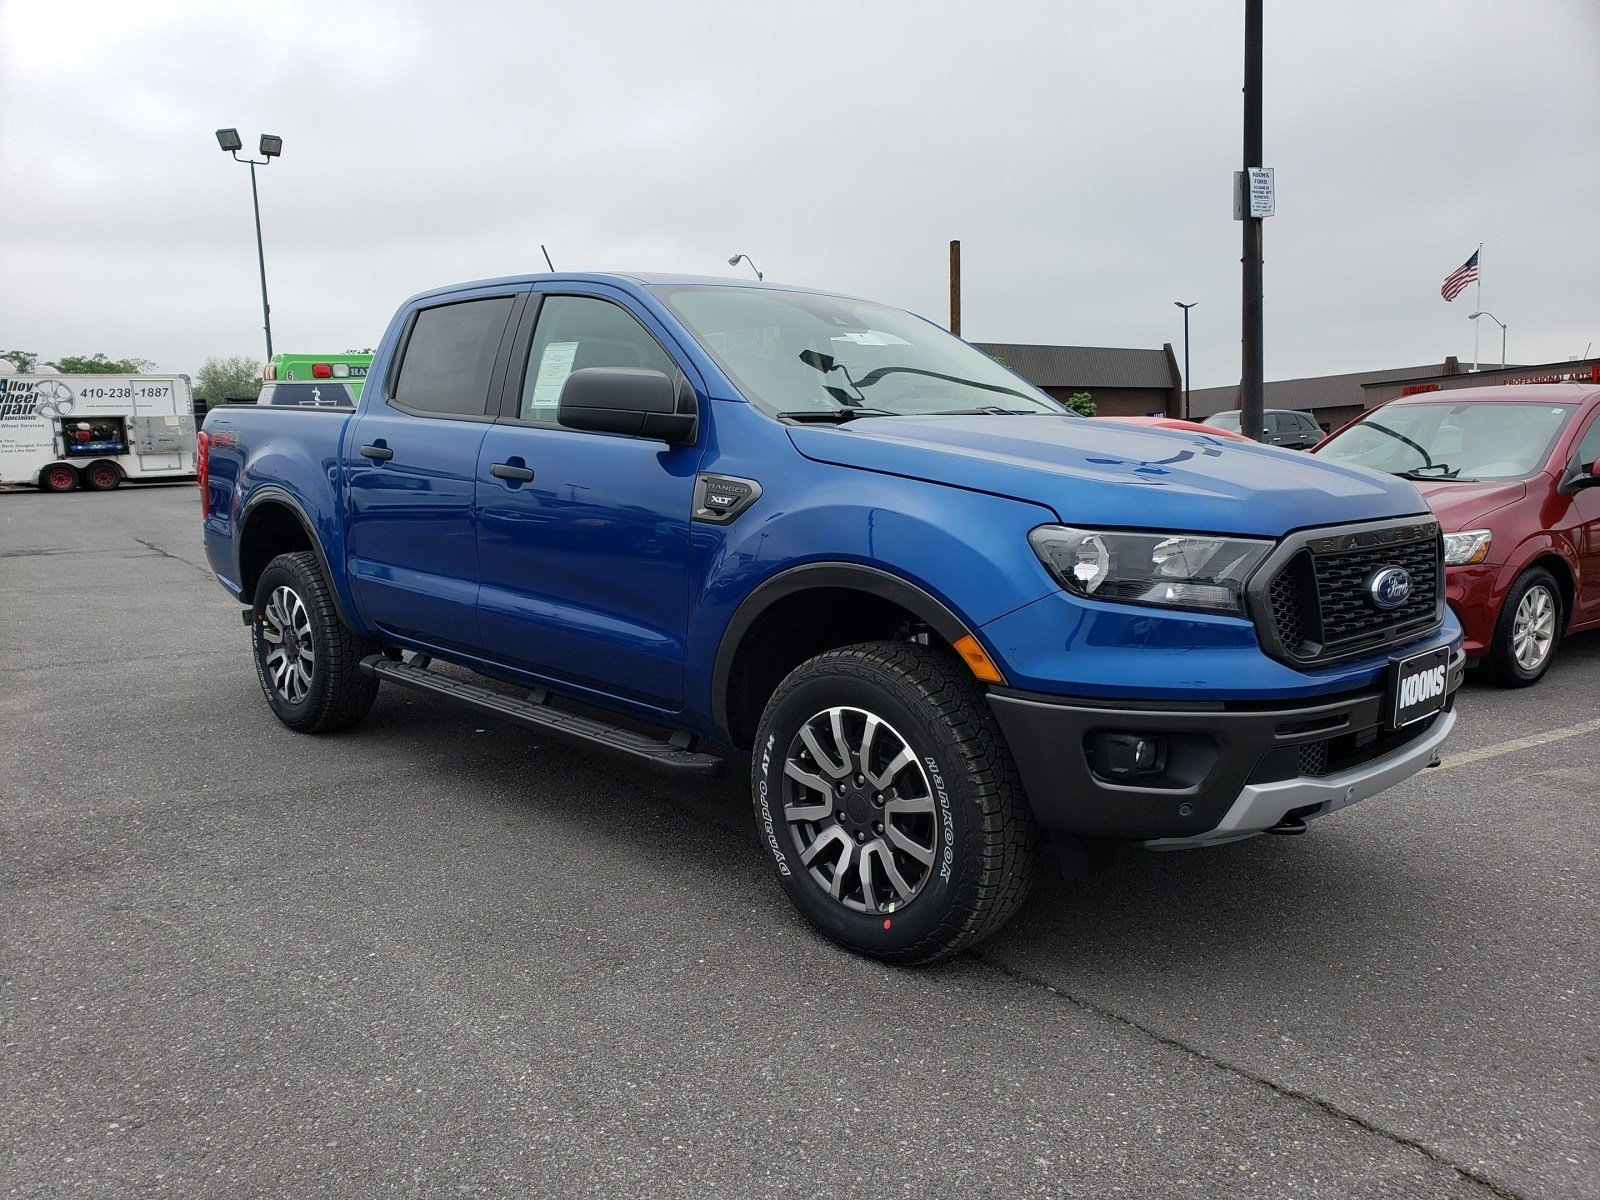 New 2019 Ford Ranger For Sale at Koons Sterling Ford | VIN